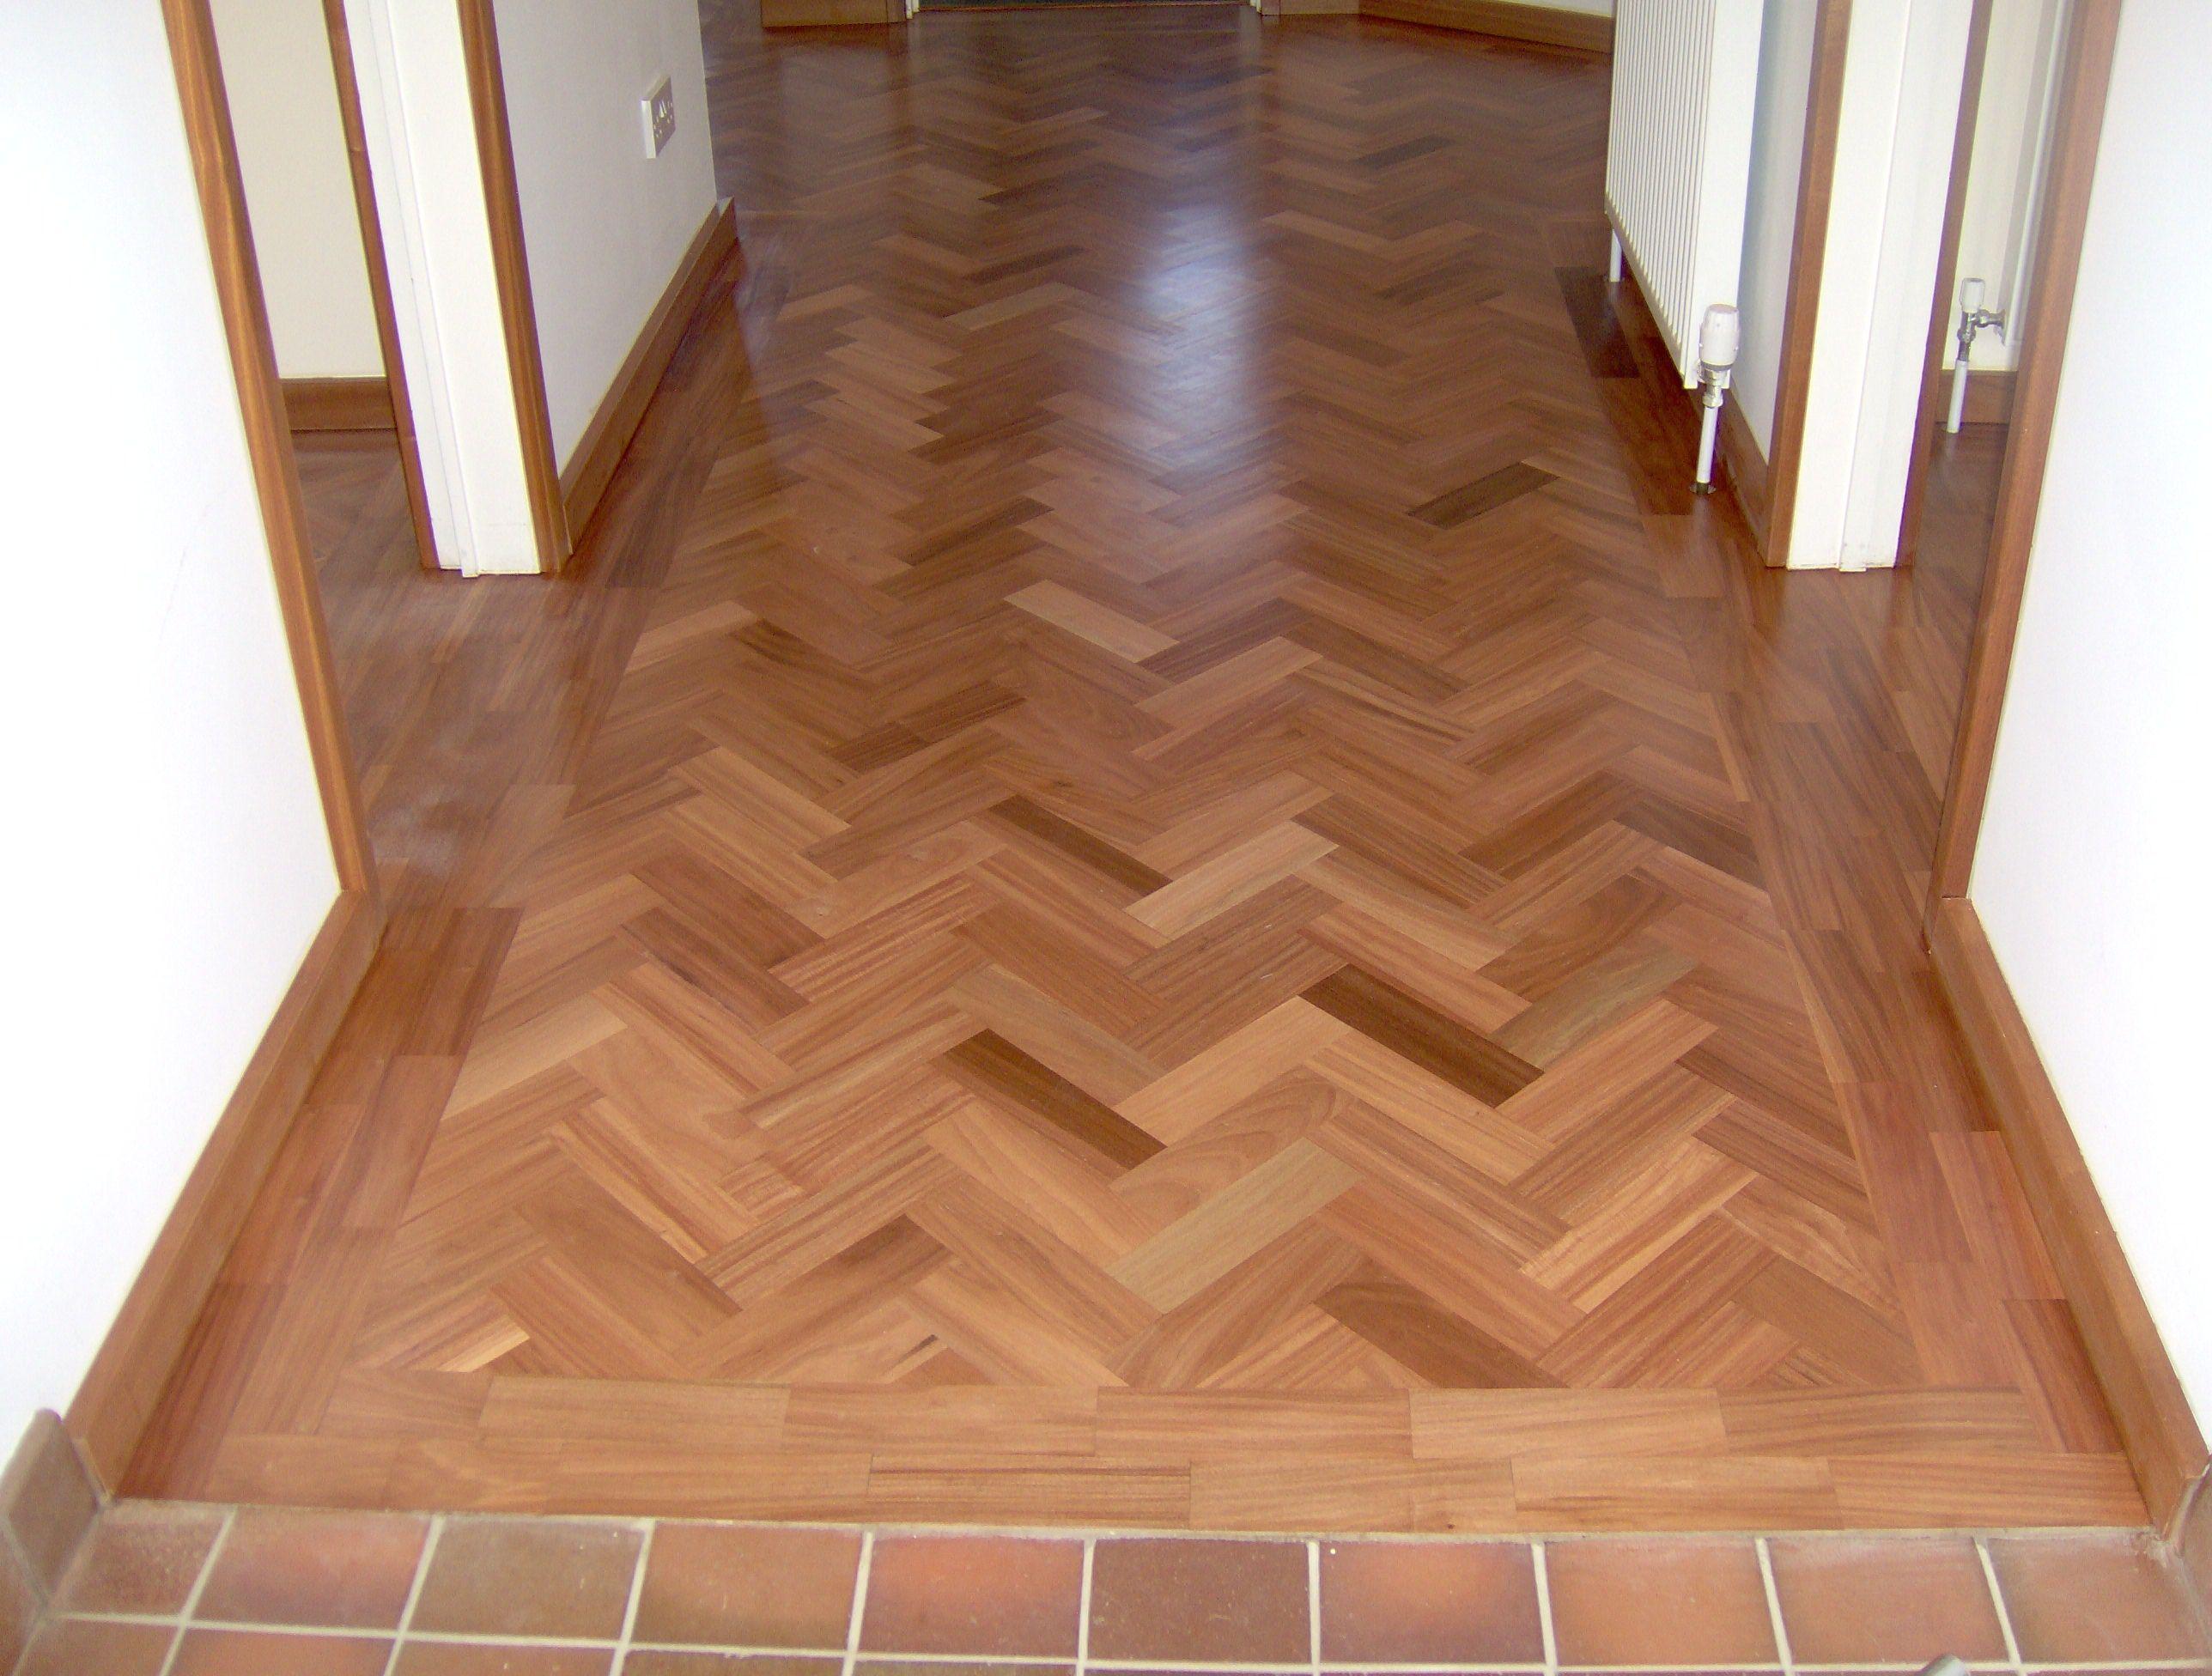 wood parkay number laminate white of floors image phone reviews parquet flooring oak floor chevron prime oiled